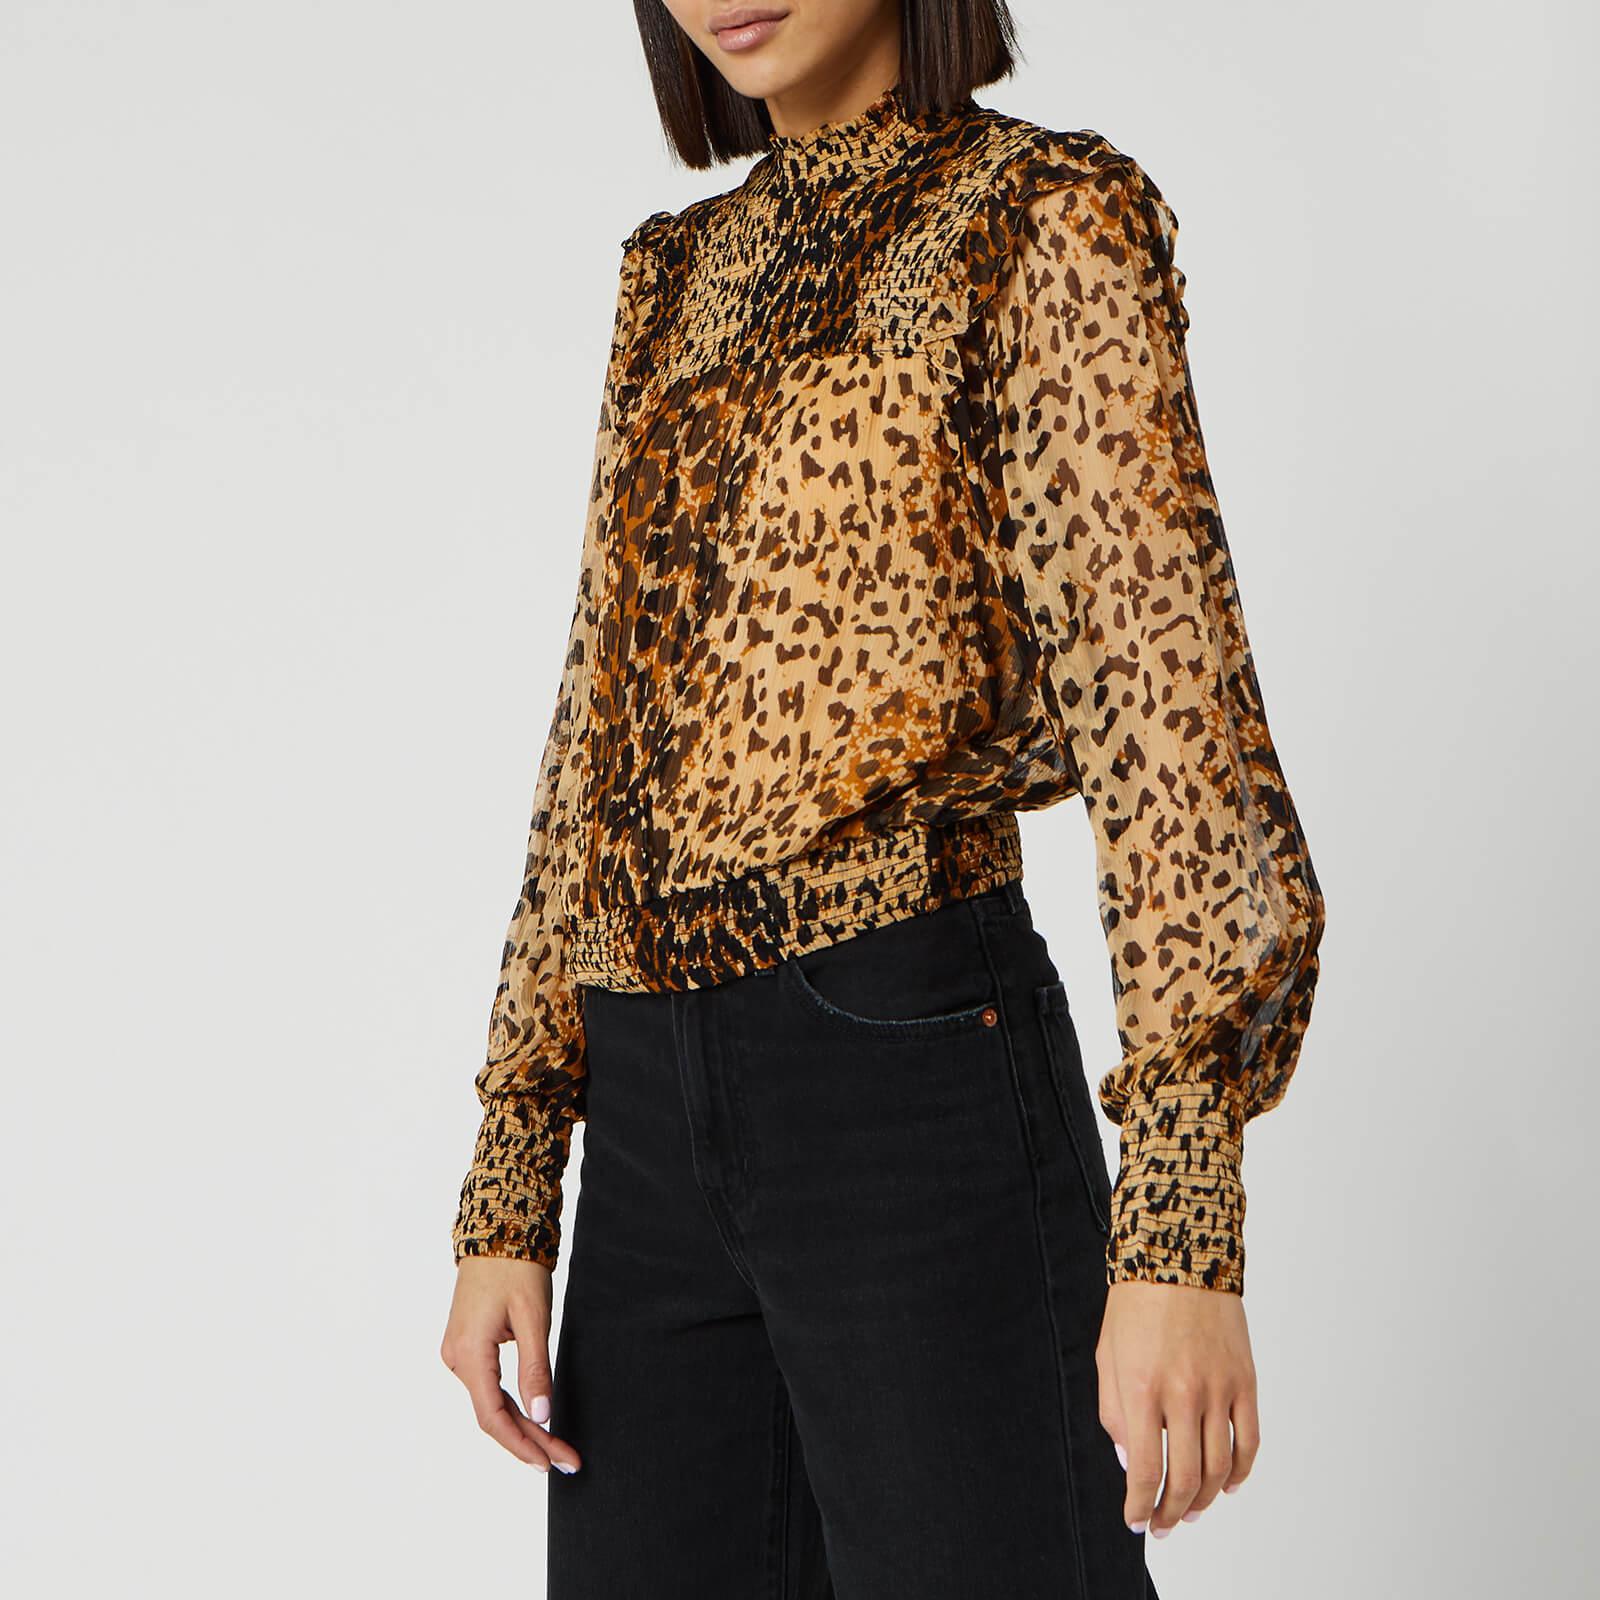 Free People Women's Roma Blouse - Brown Leopard - L